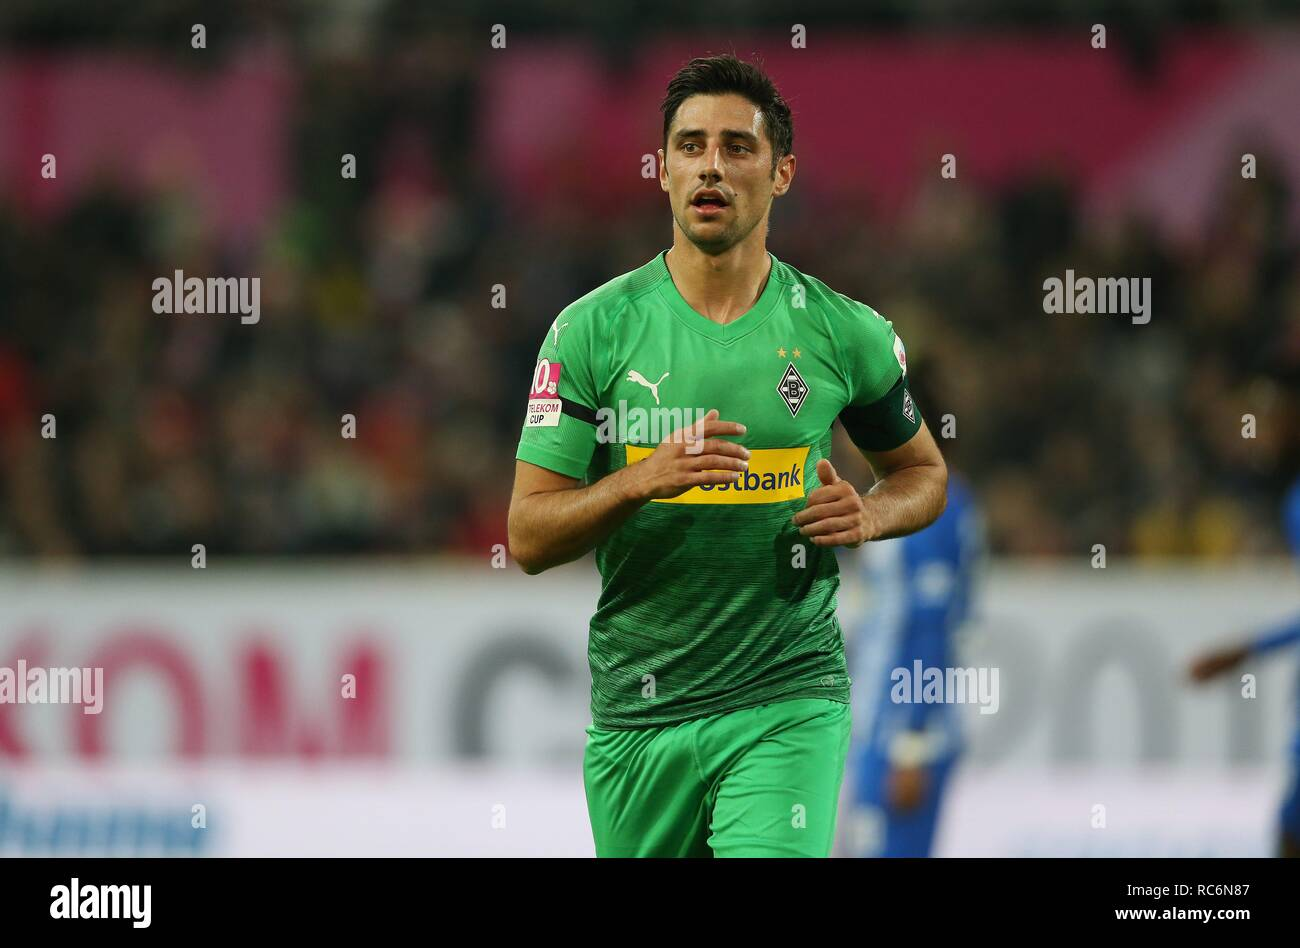 firo: 13.01.2019, football, 1.Bundesliga, season 2018/2019, Telekom-Cup 2019, Borussia Monchengladbach, Gladbach, Lars STINDL, half figure   usage worldwide - Stock Image